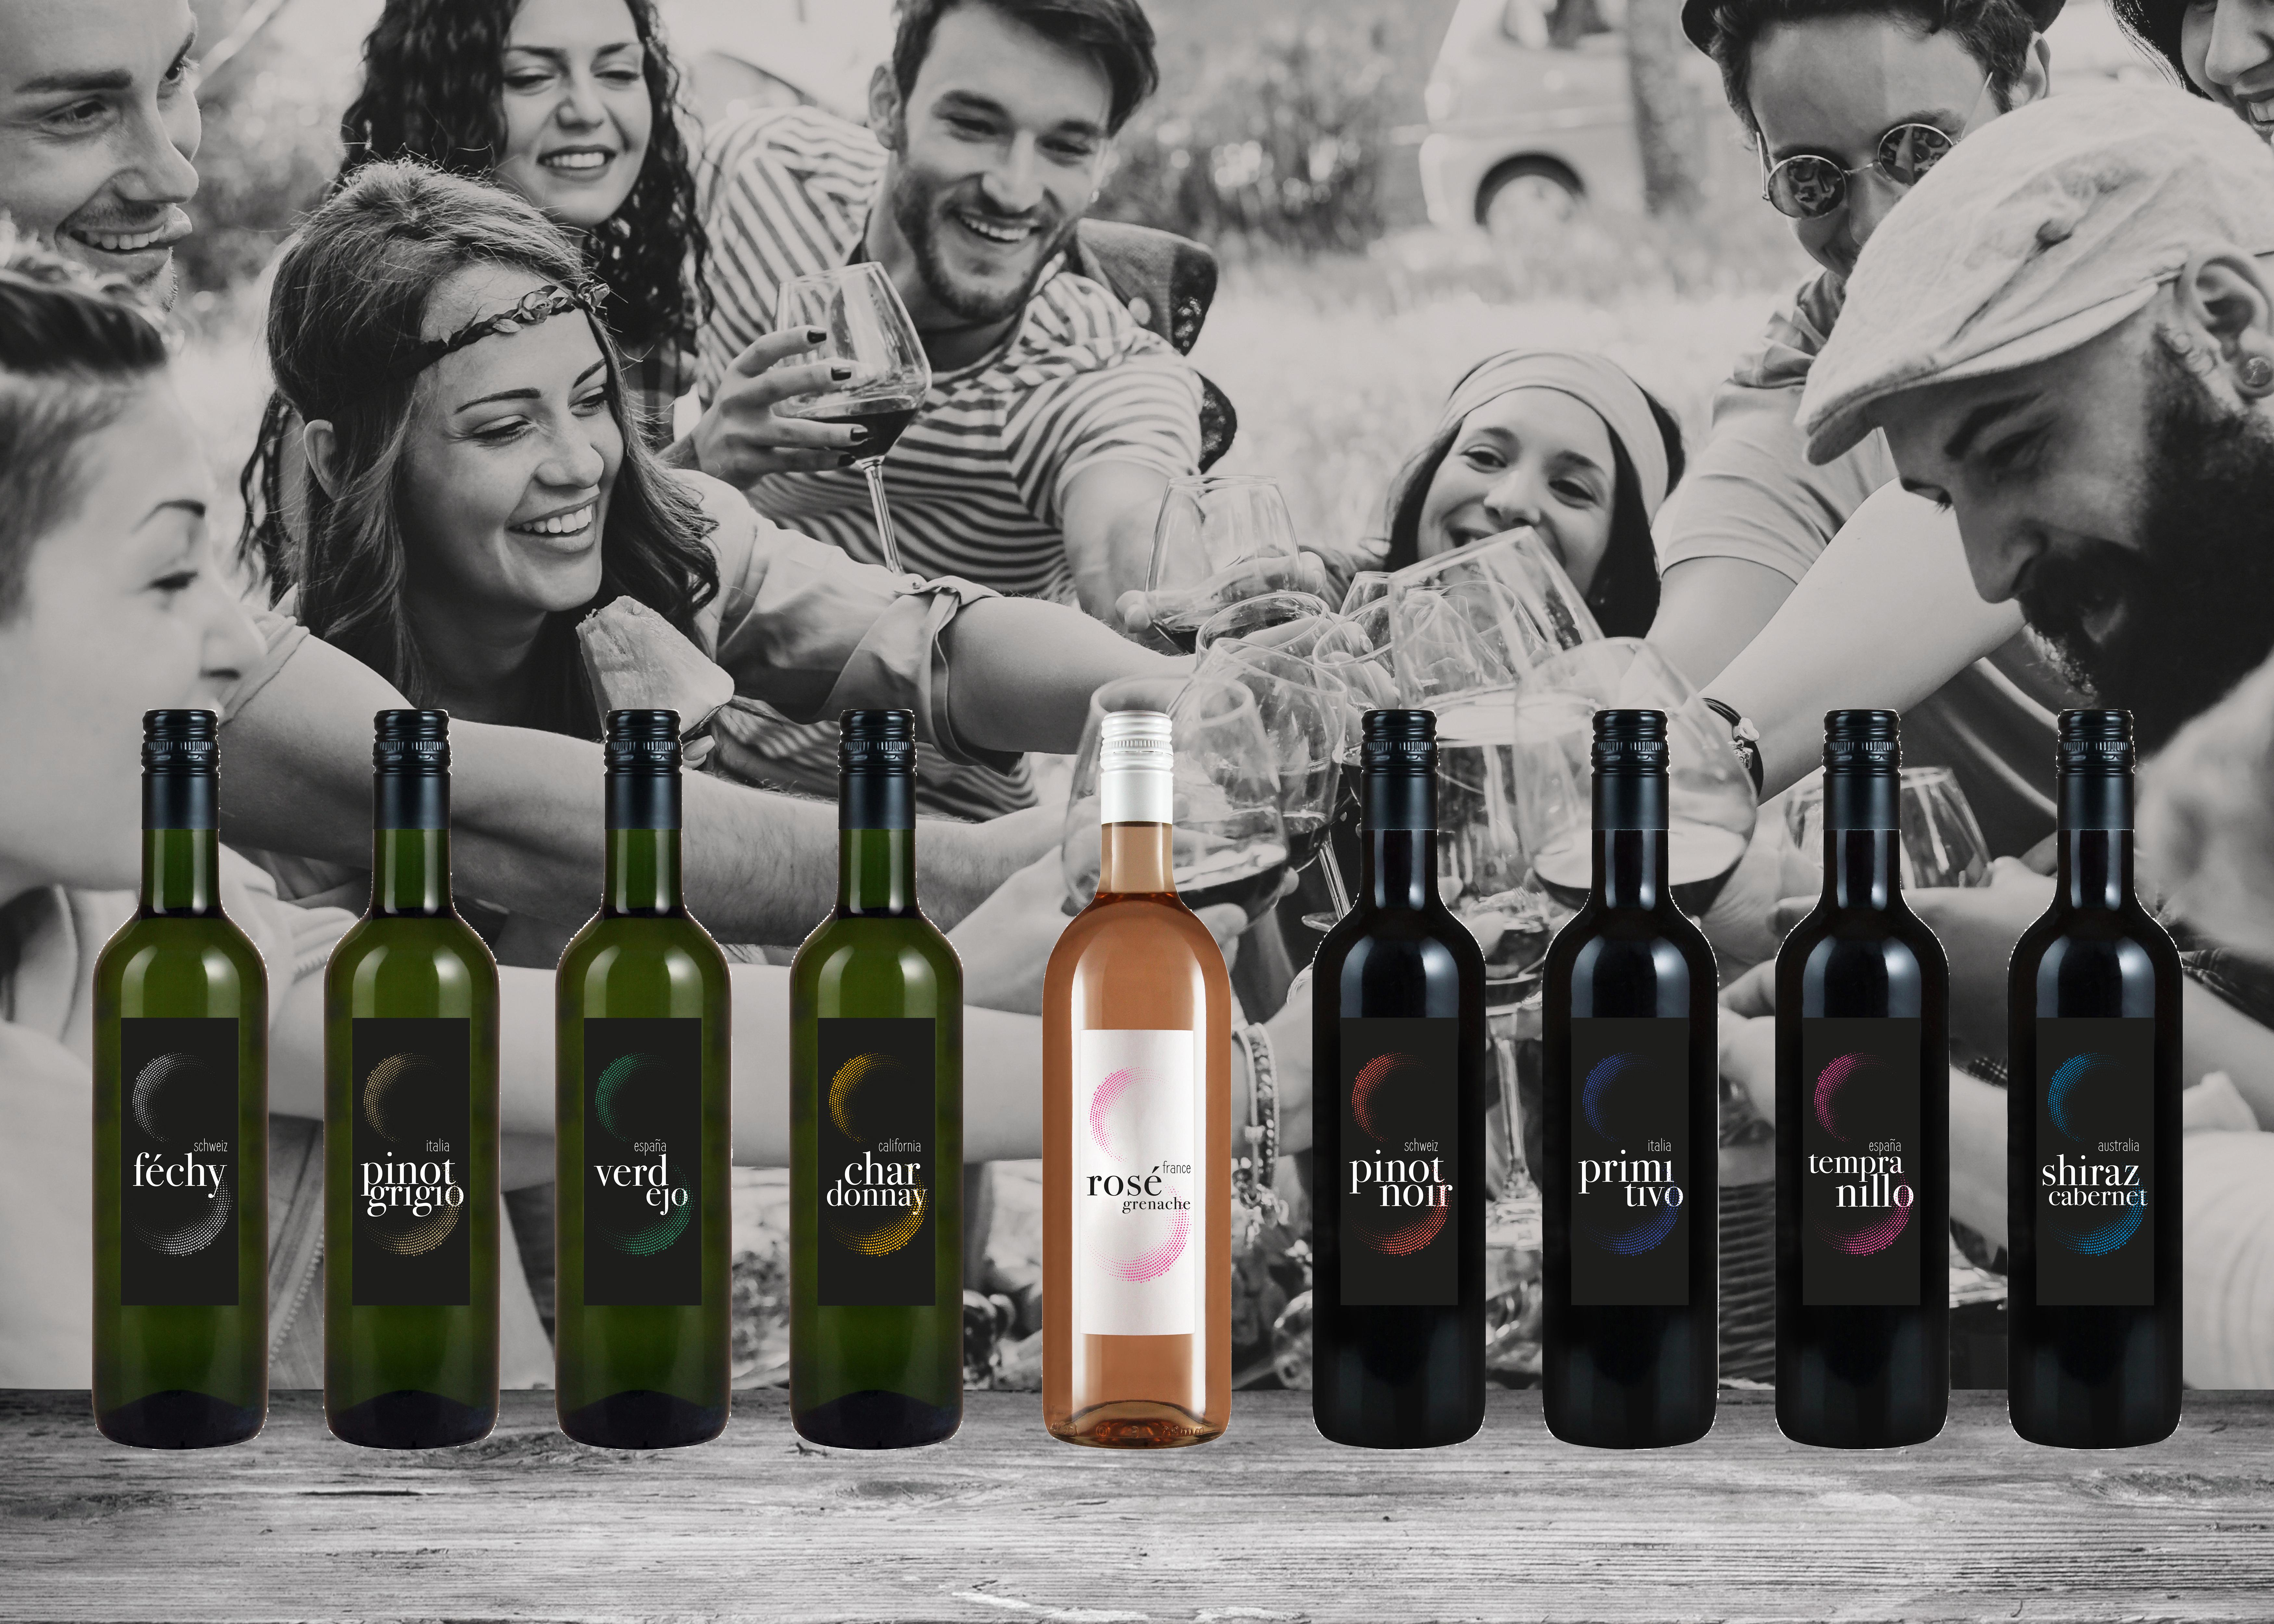 Marchio proprio: vino SwissDrink